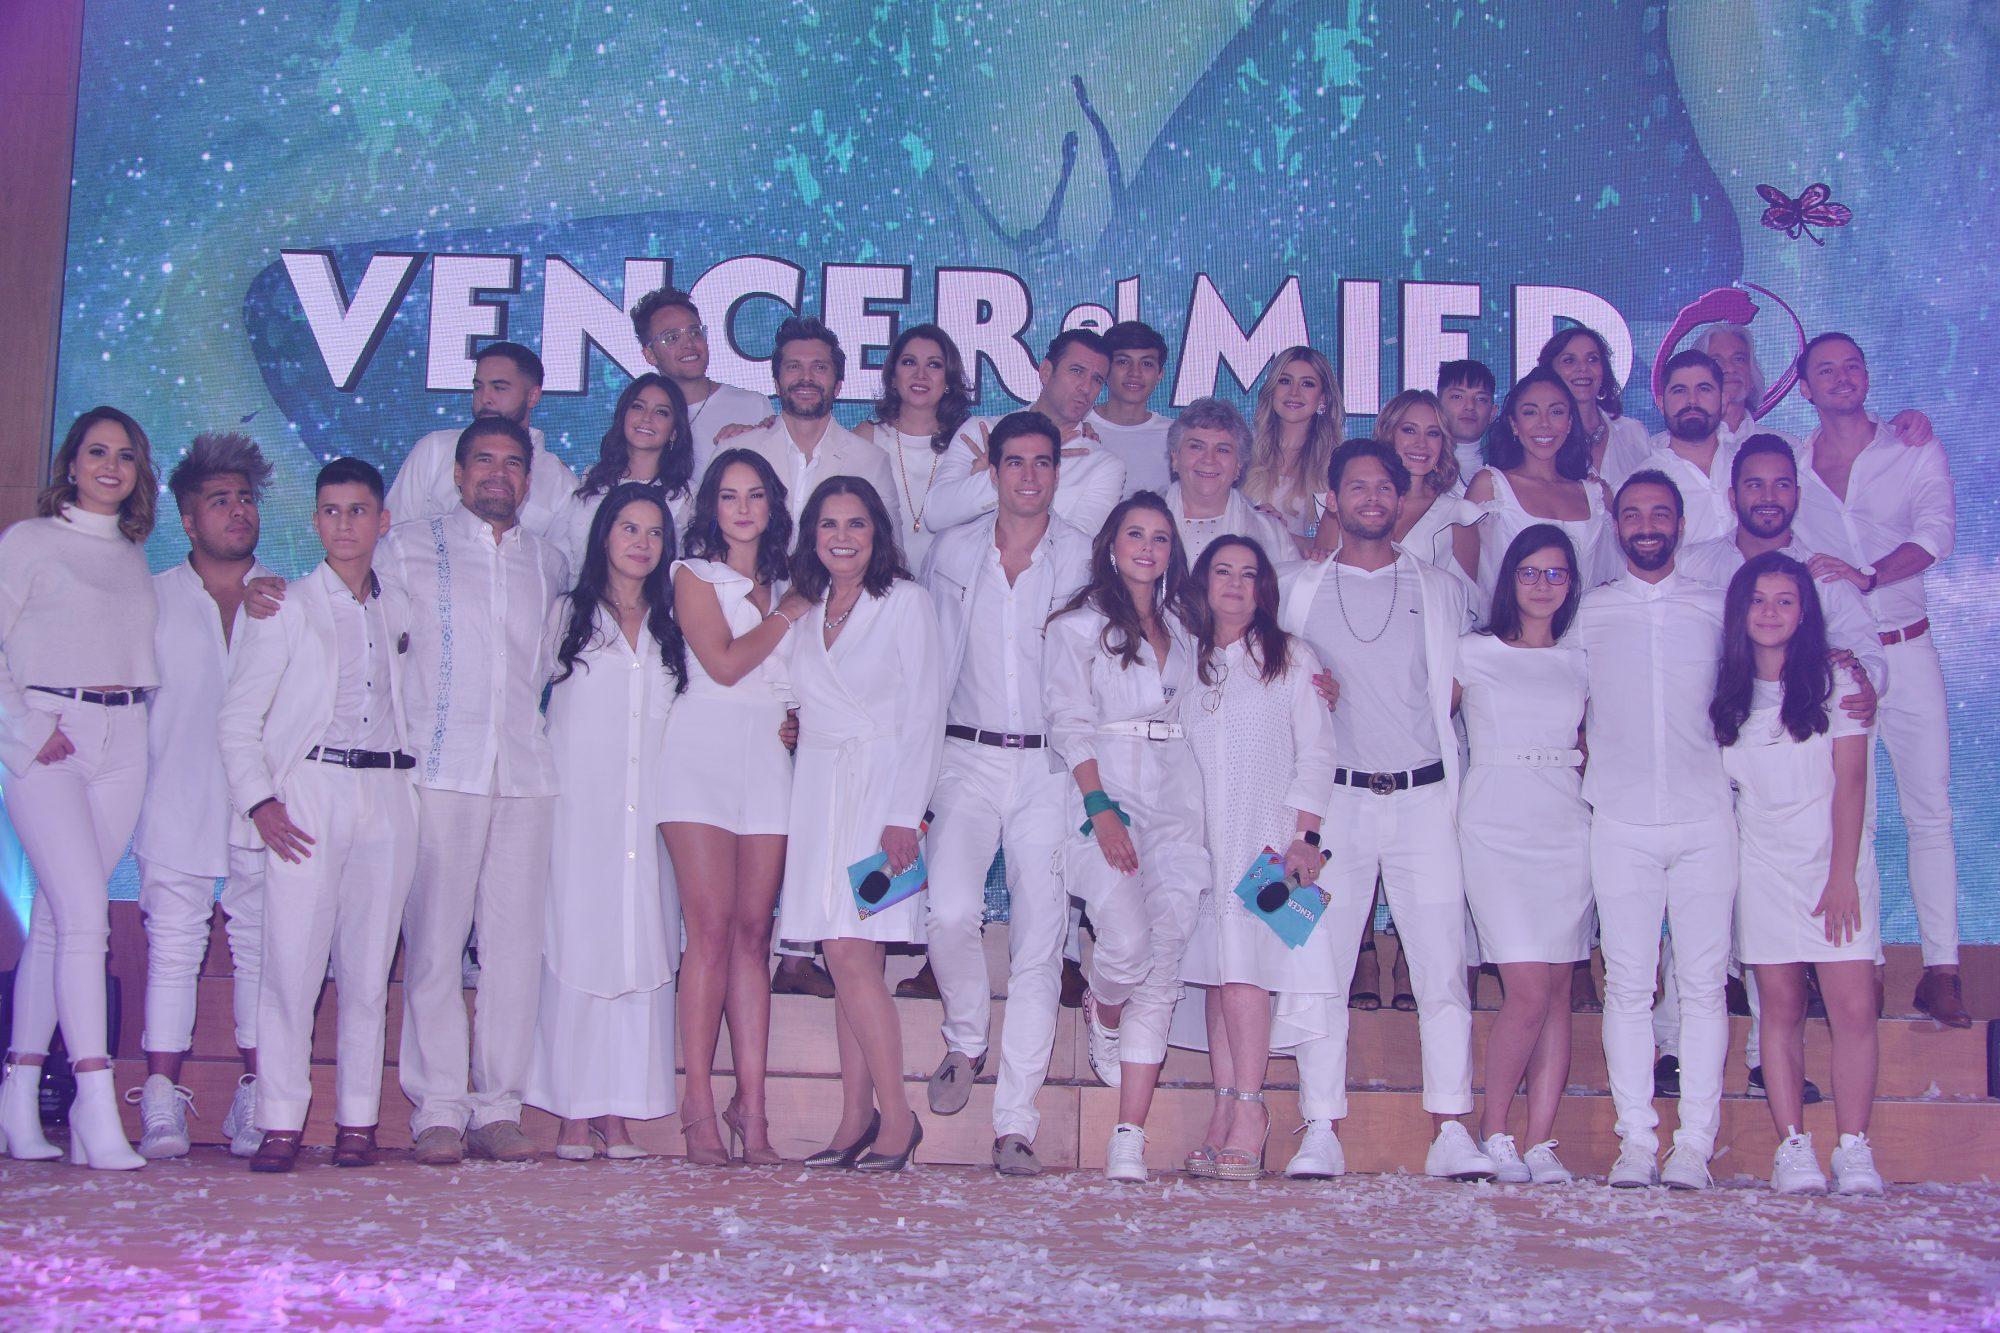 Elenco posan durante la presentacion oficial de la Telenovela 'Vencer el Medio'